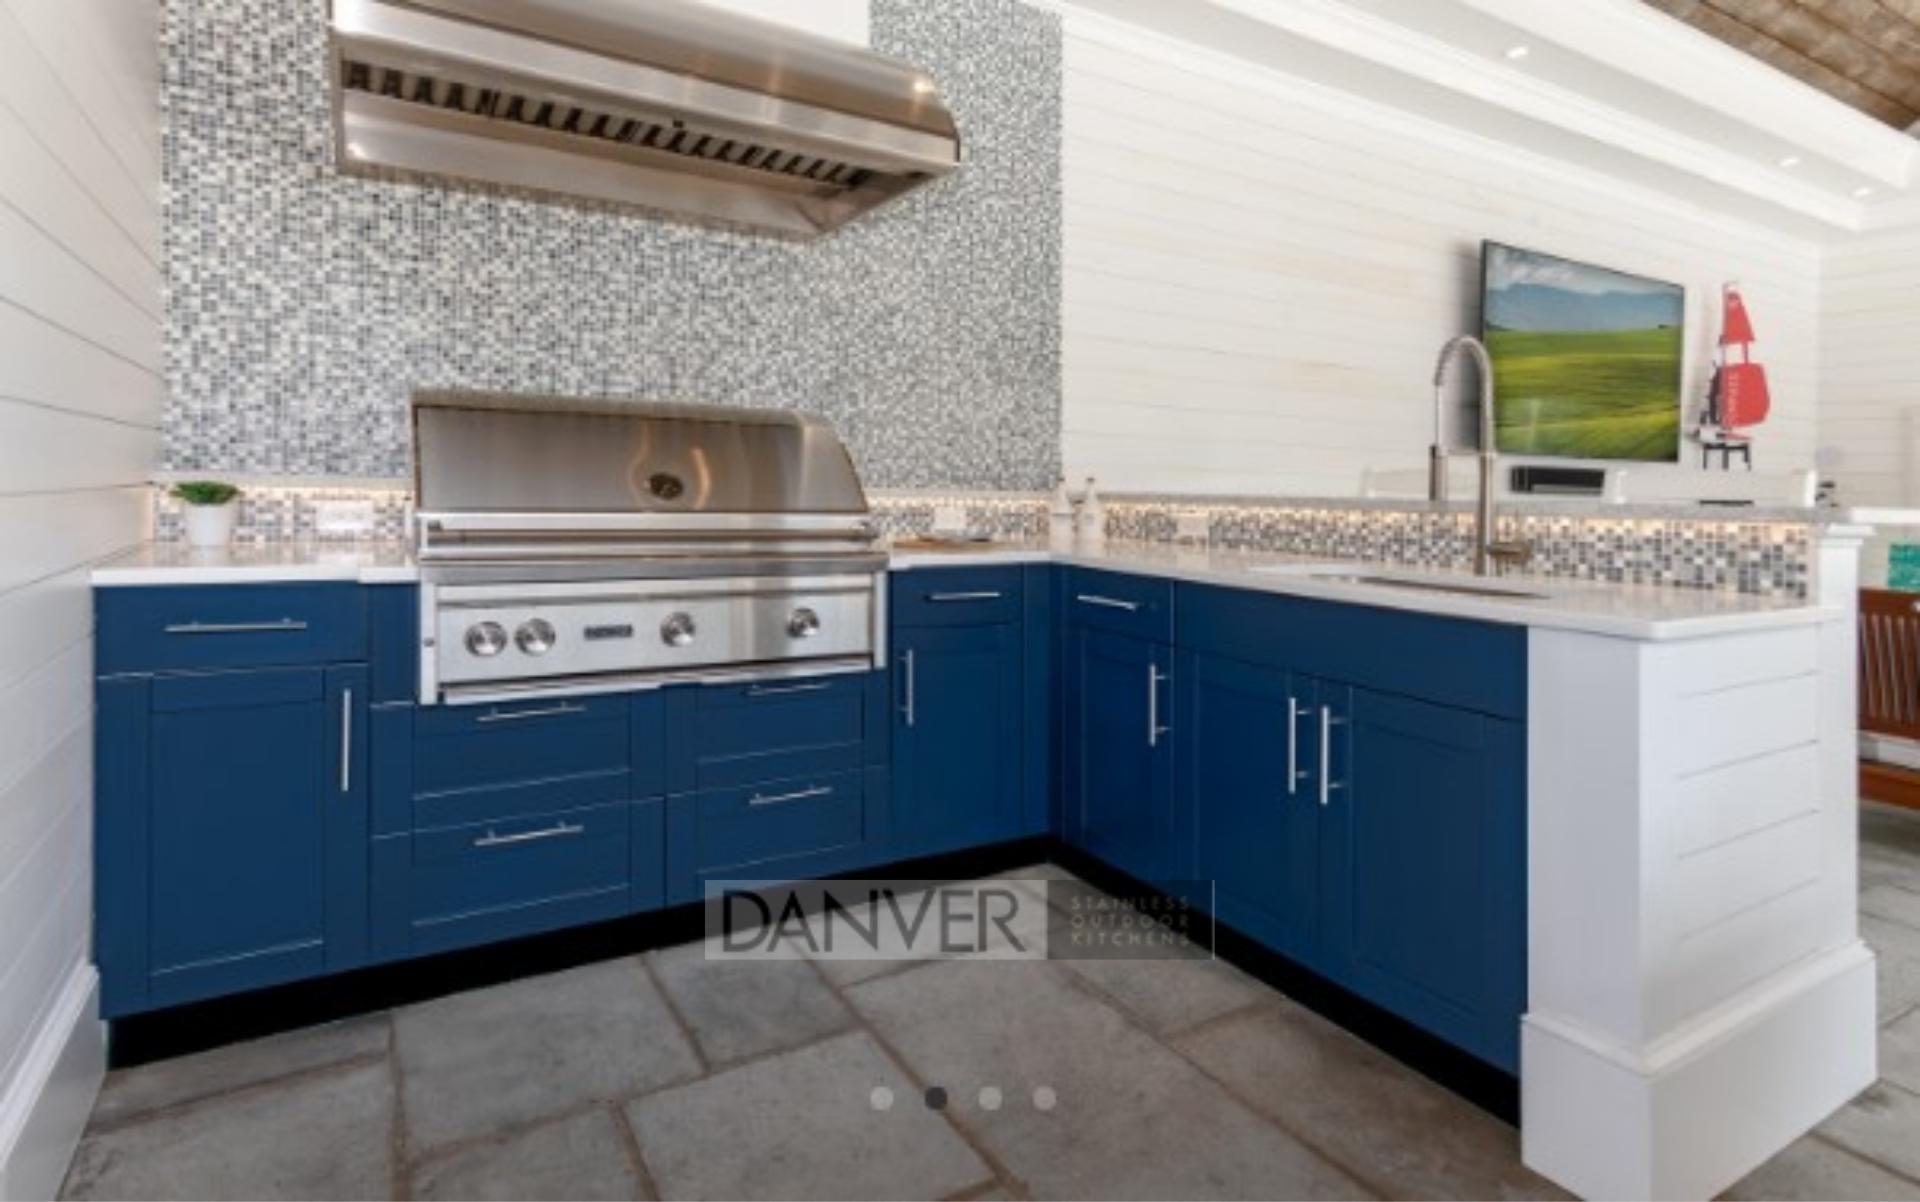 Danver Stainless Steel Outdoor Kitchens Outdoor Kitchen Cabinets Outdoor Kitchen Luxury Outdoor Kitchen